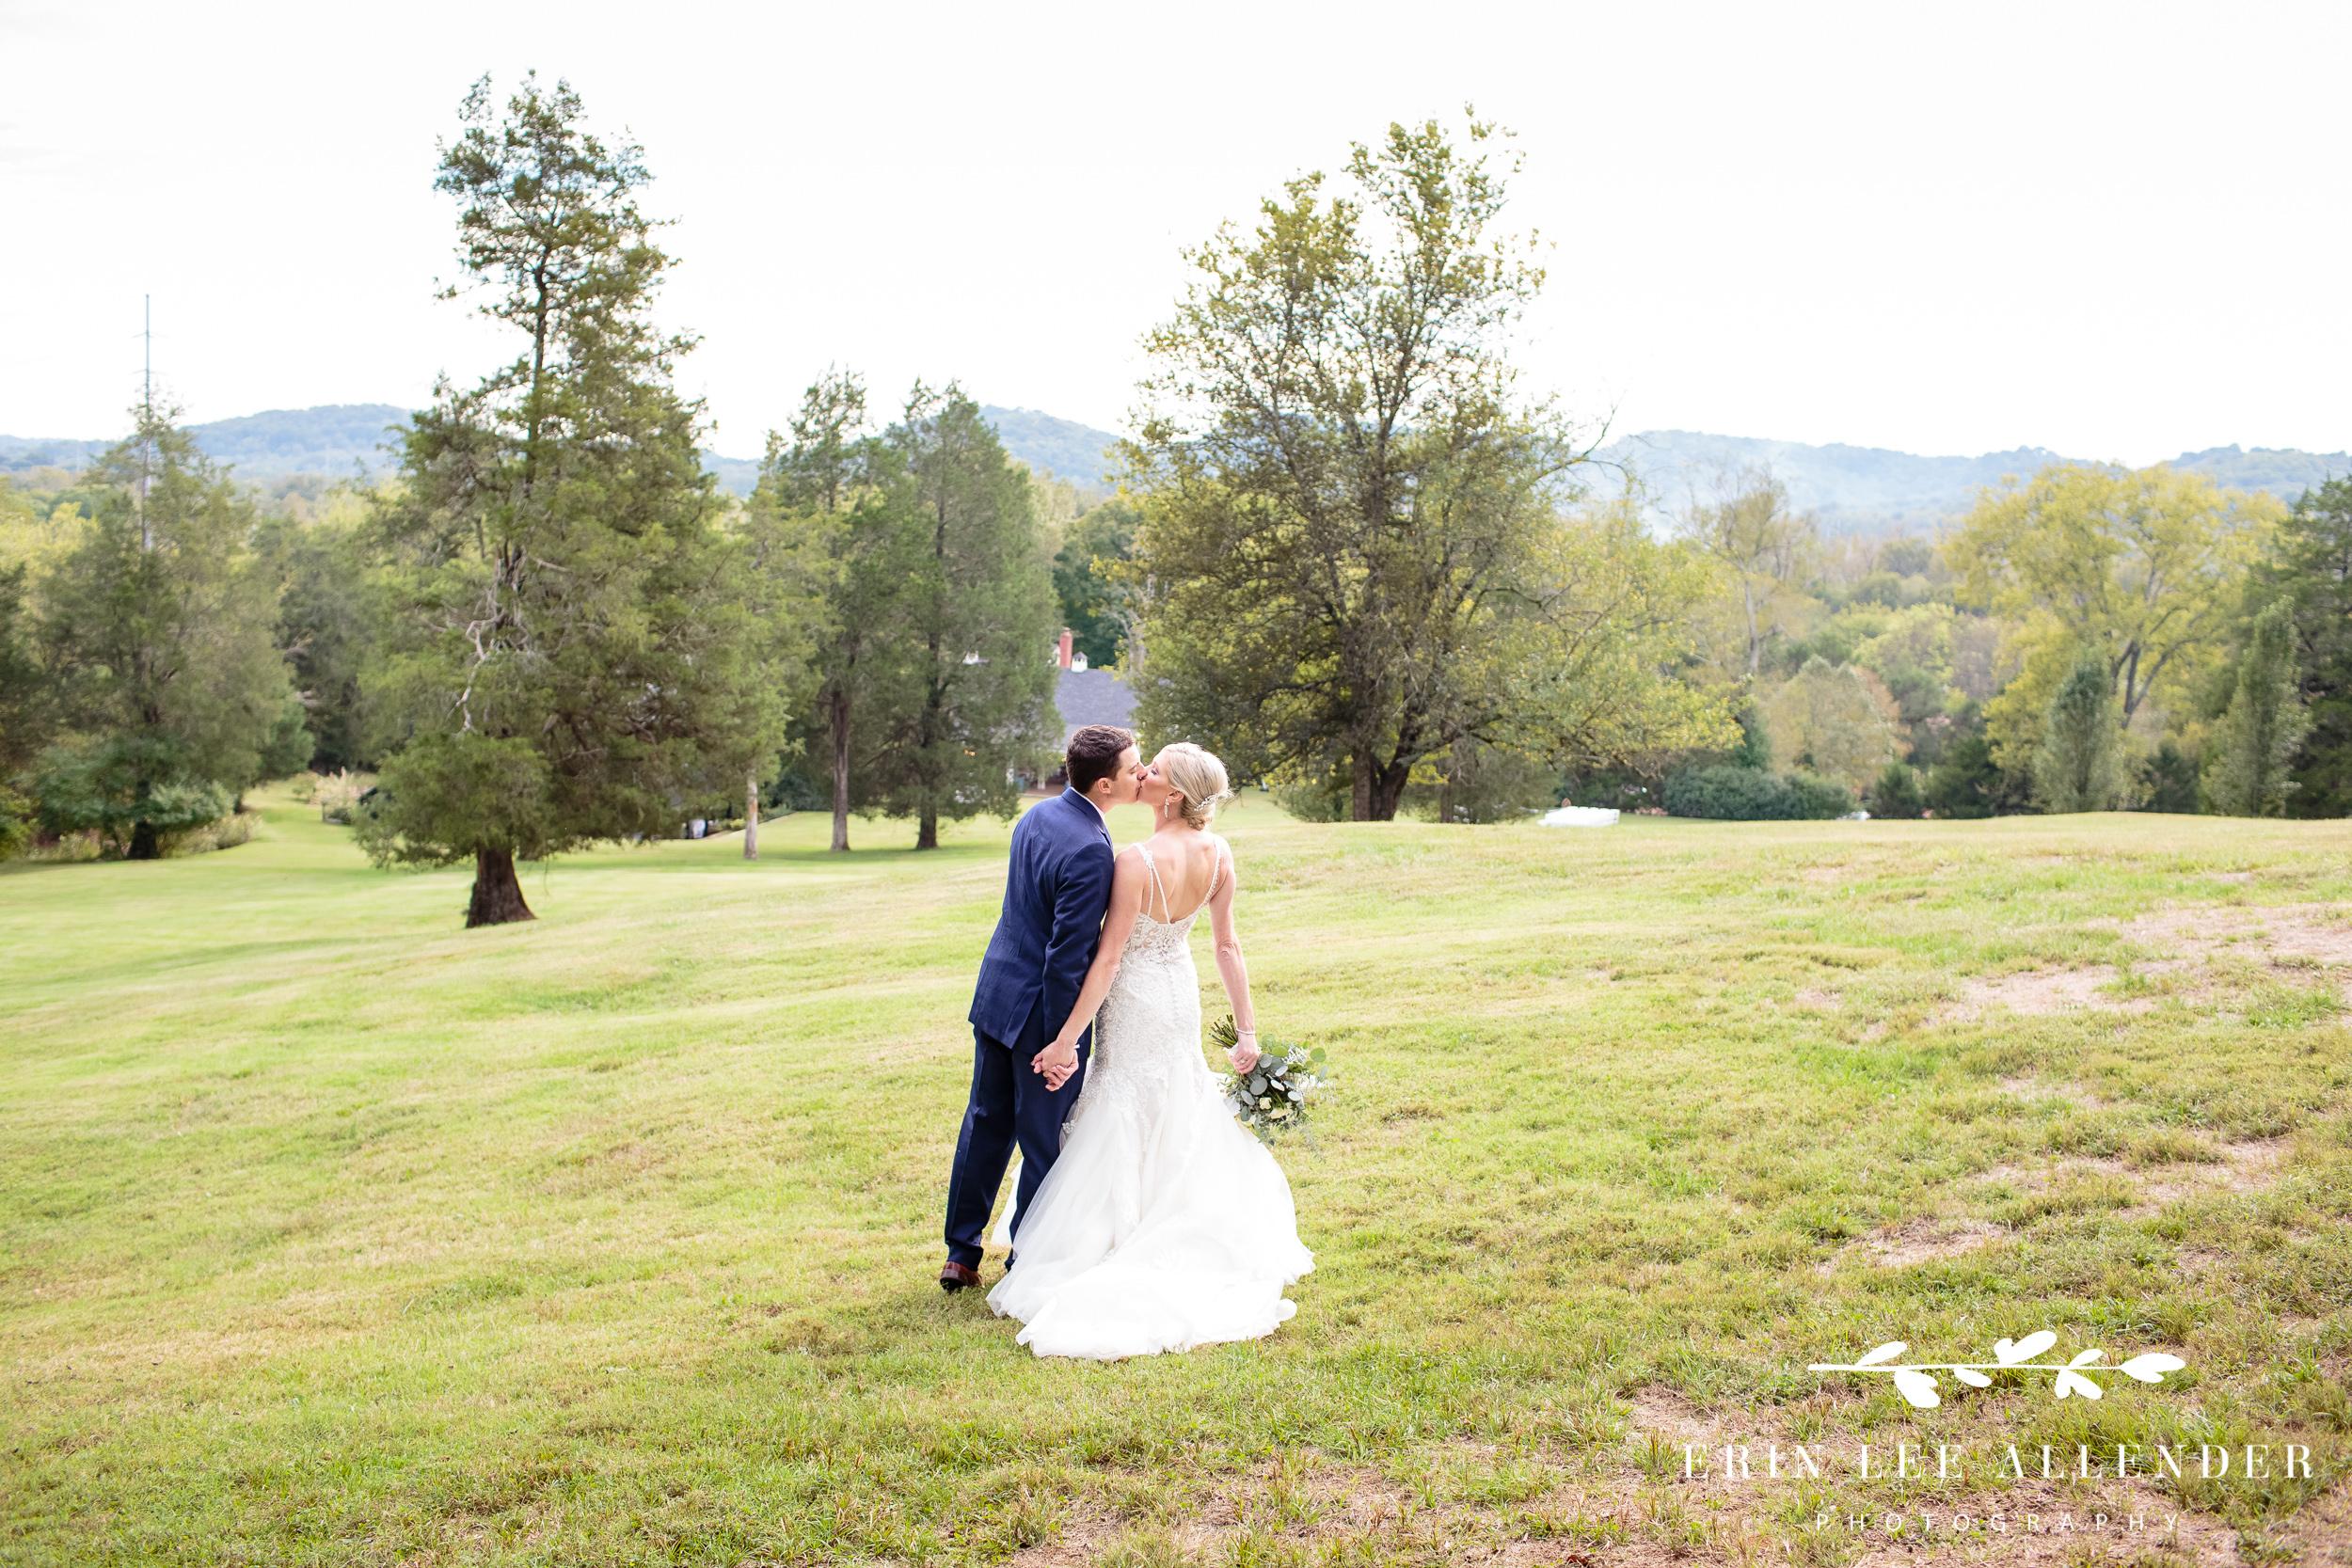 Bride-Groom-Tennessee-Hills